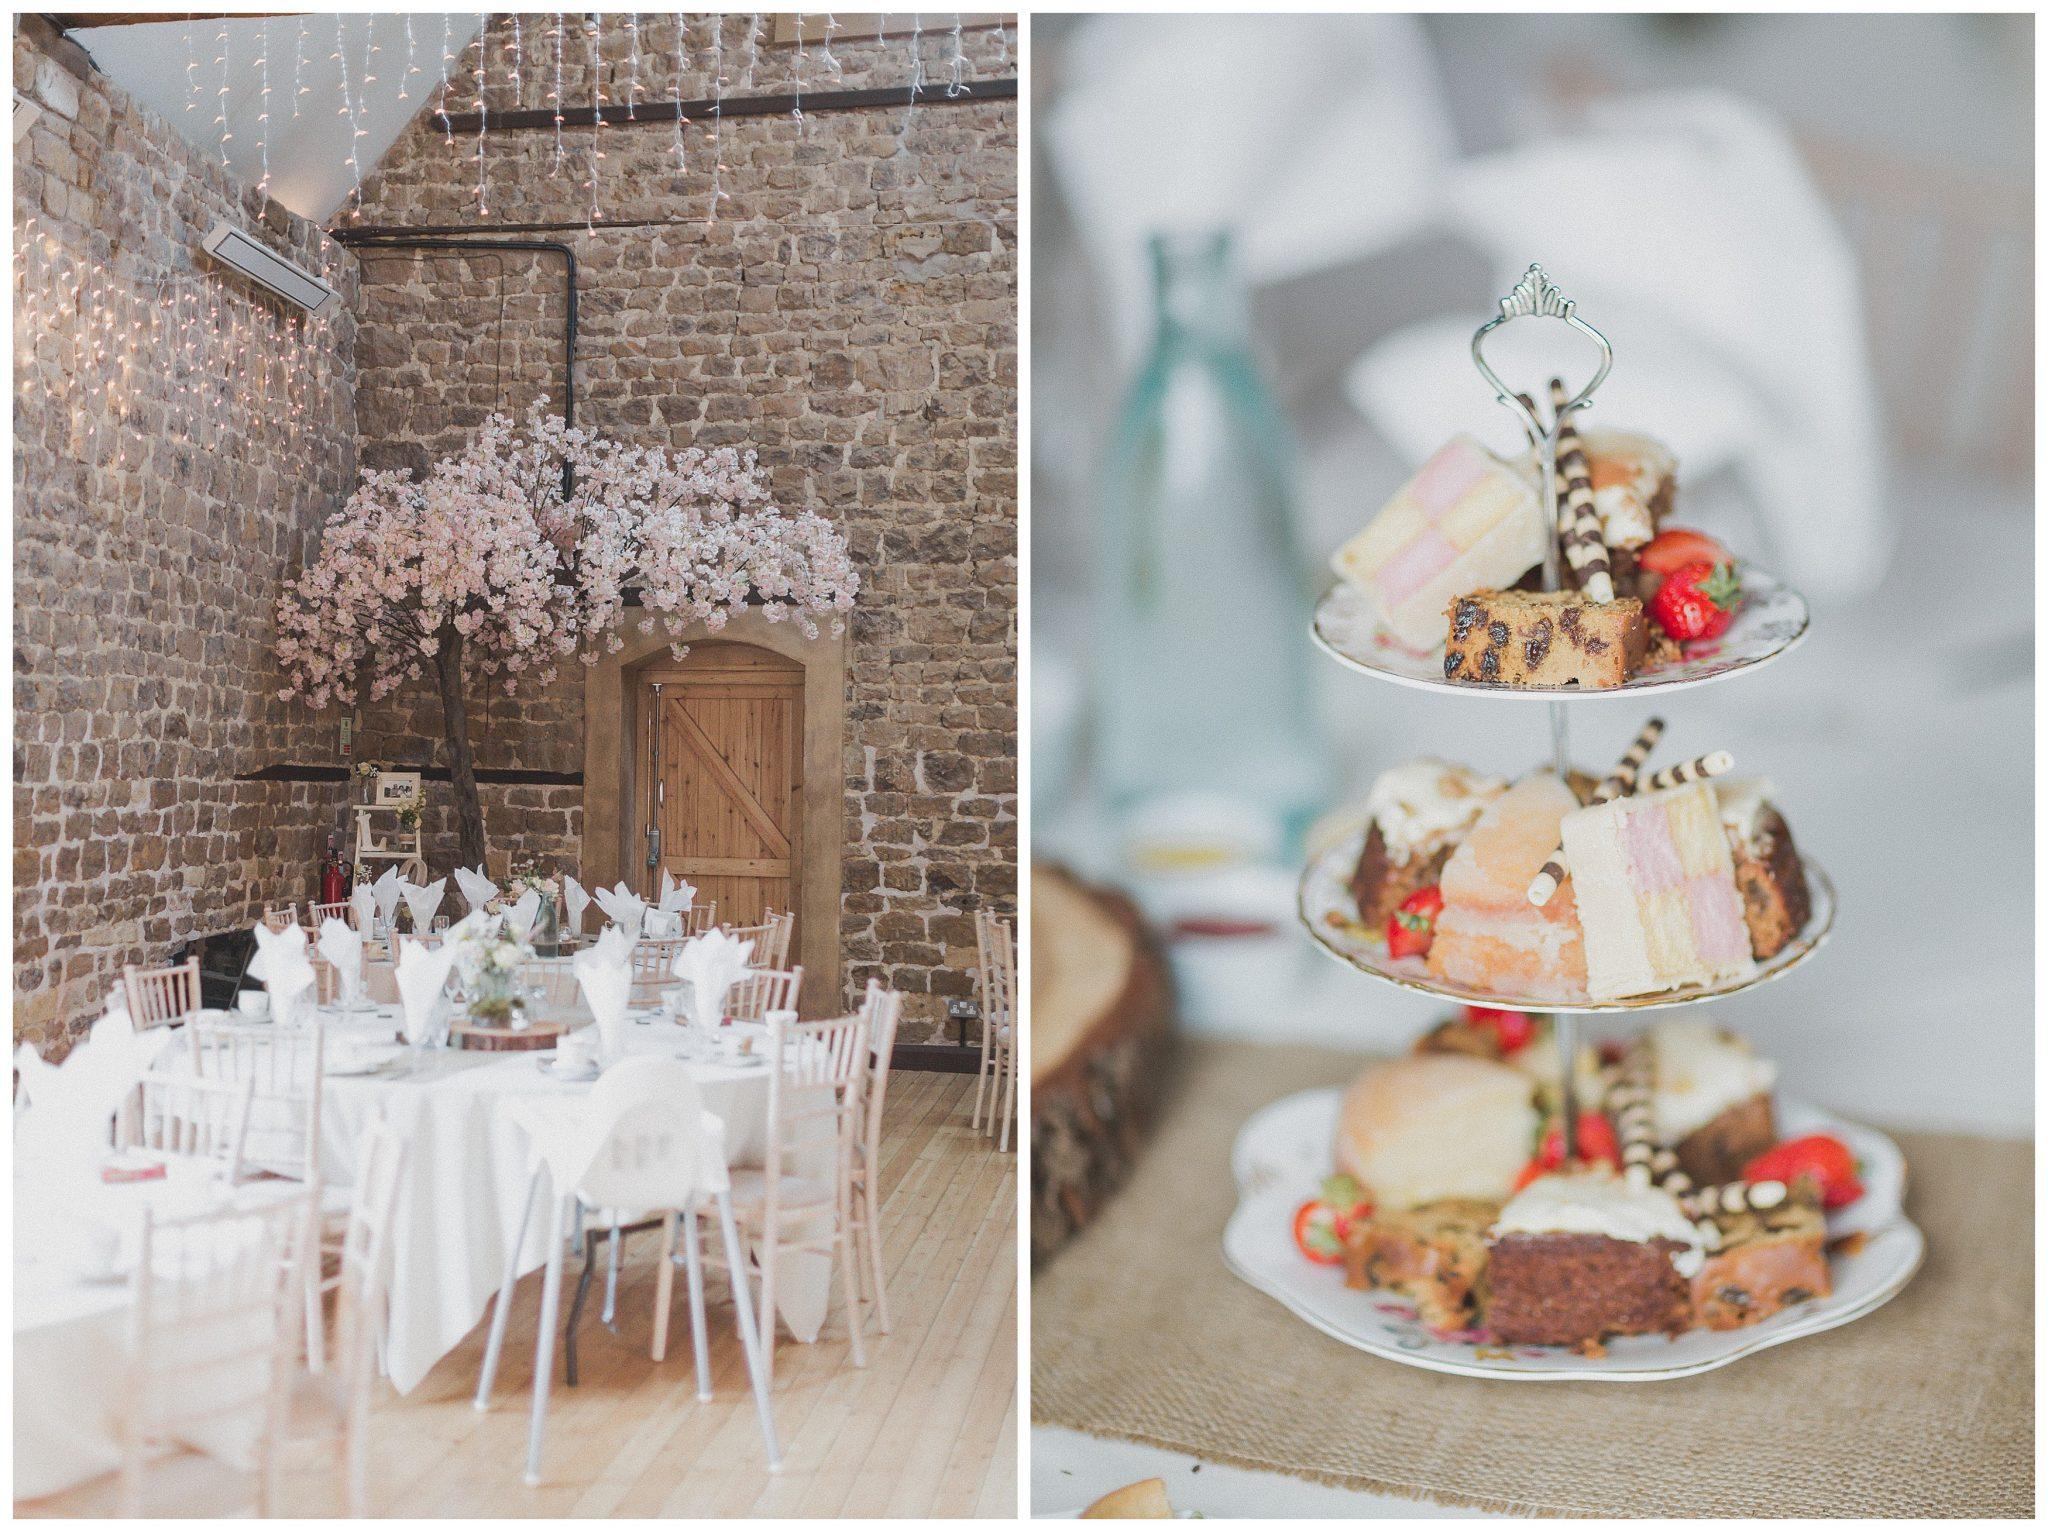 Rustic Wedding Venue the Barns at Hunsbury